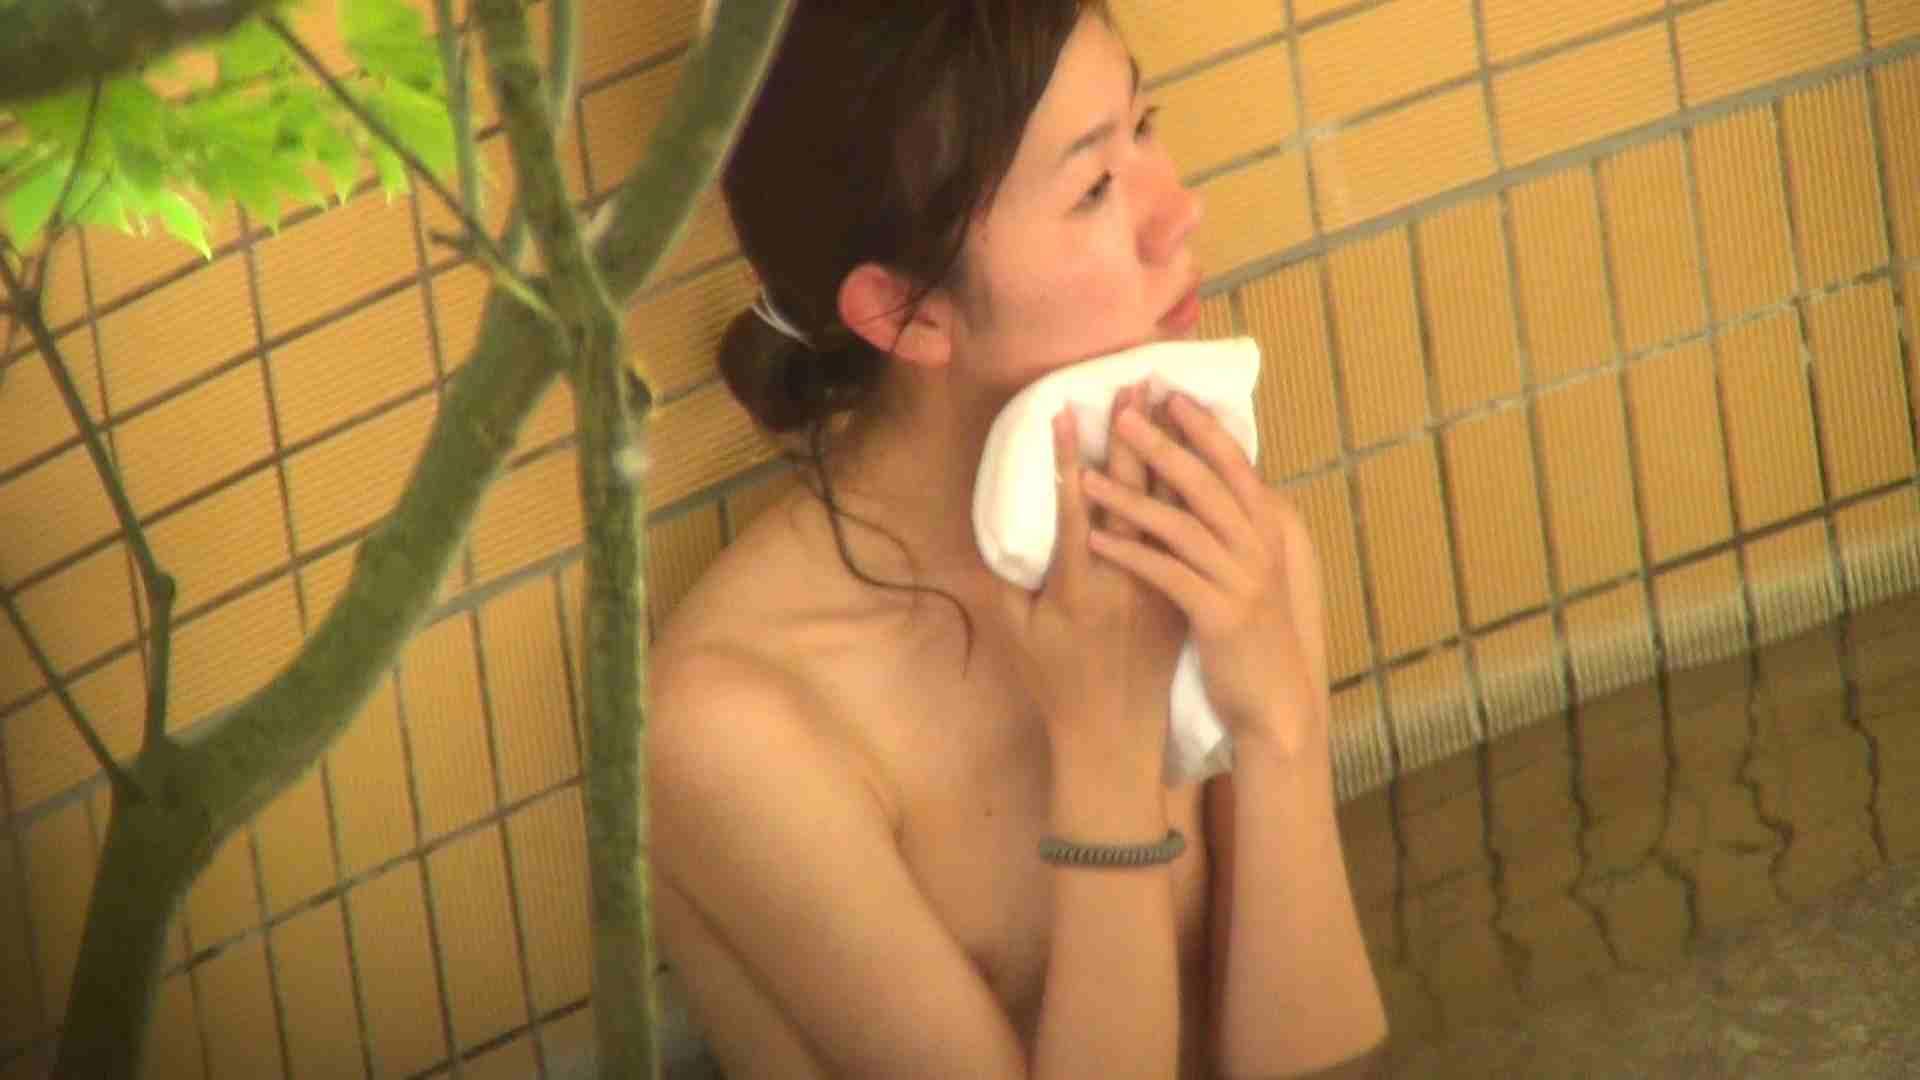 Vol.77 お上品な貧乳色白お女市さまの裸を見る醍醐味 美女  57PIX 54